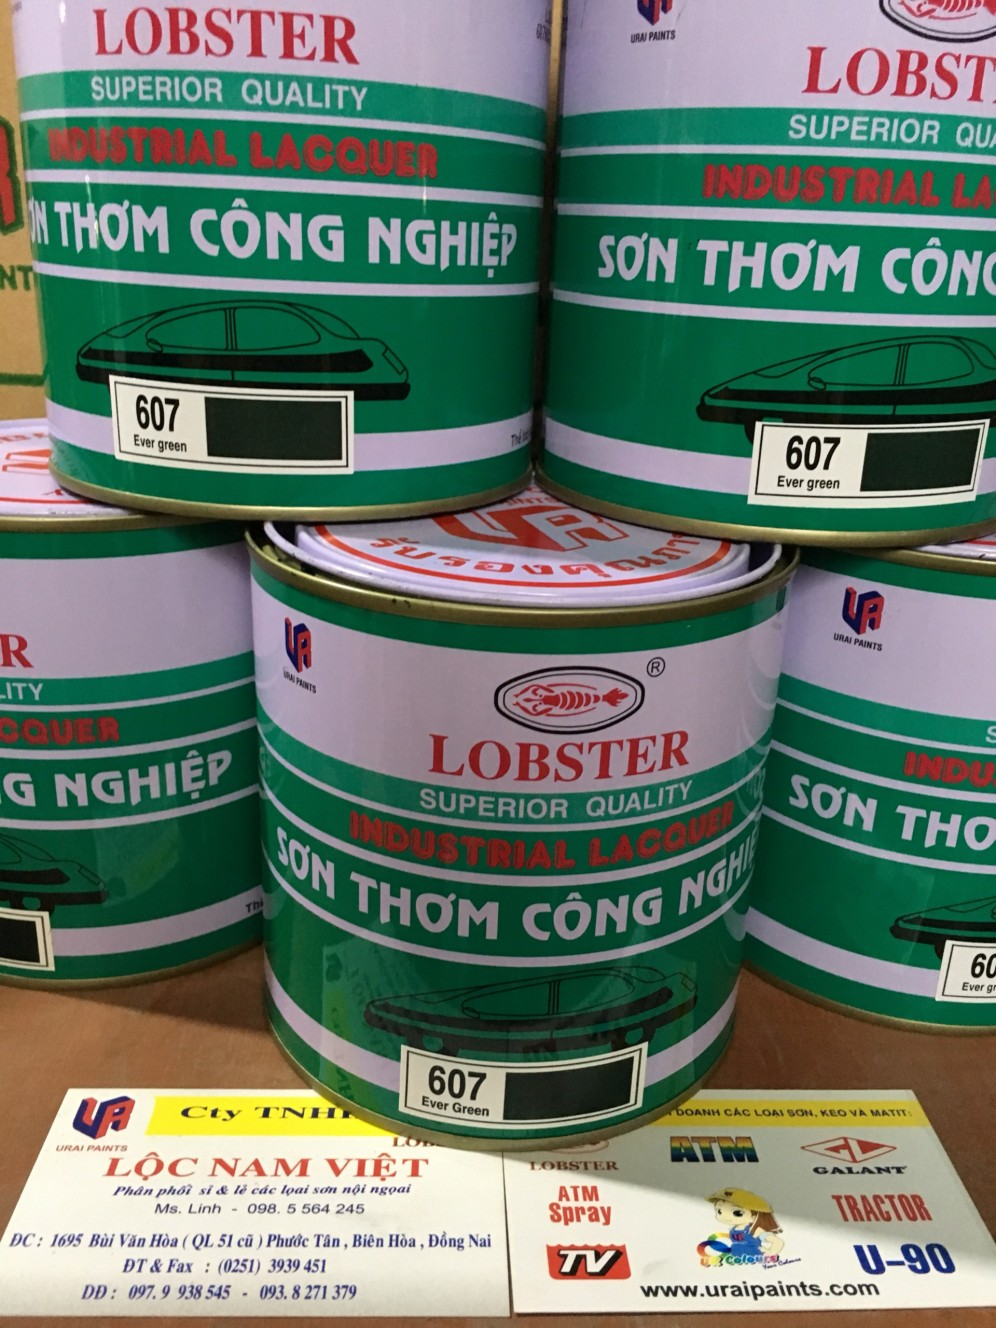 SON THOM CN LOBSTER 607 (6)